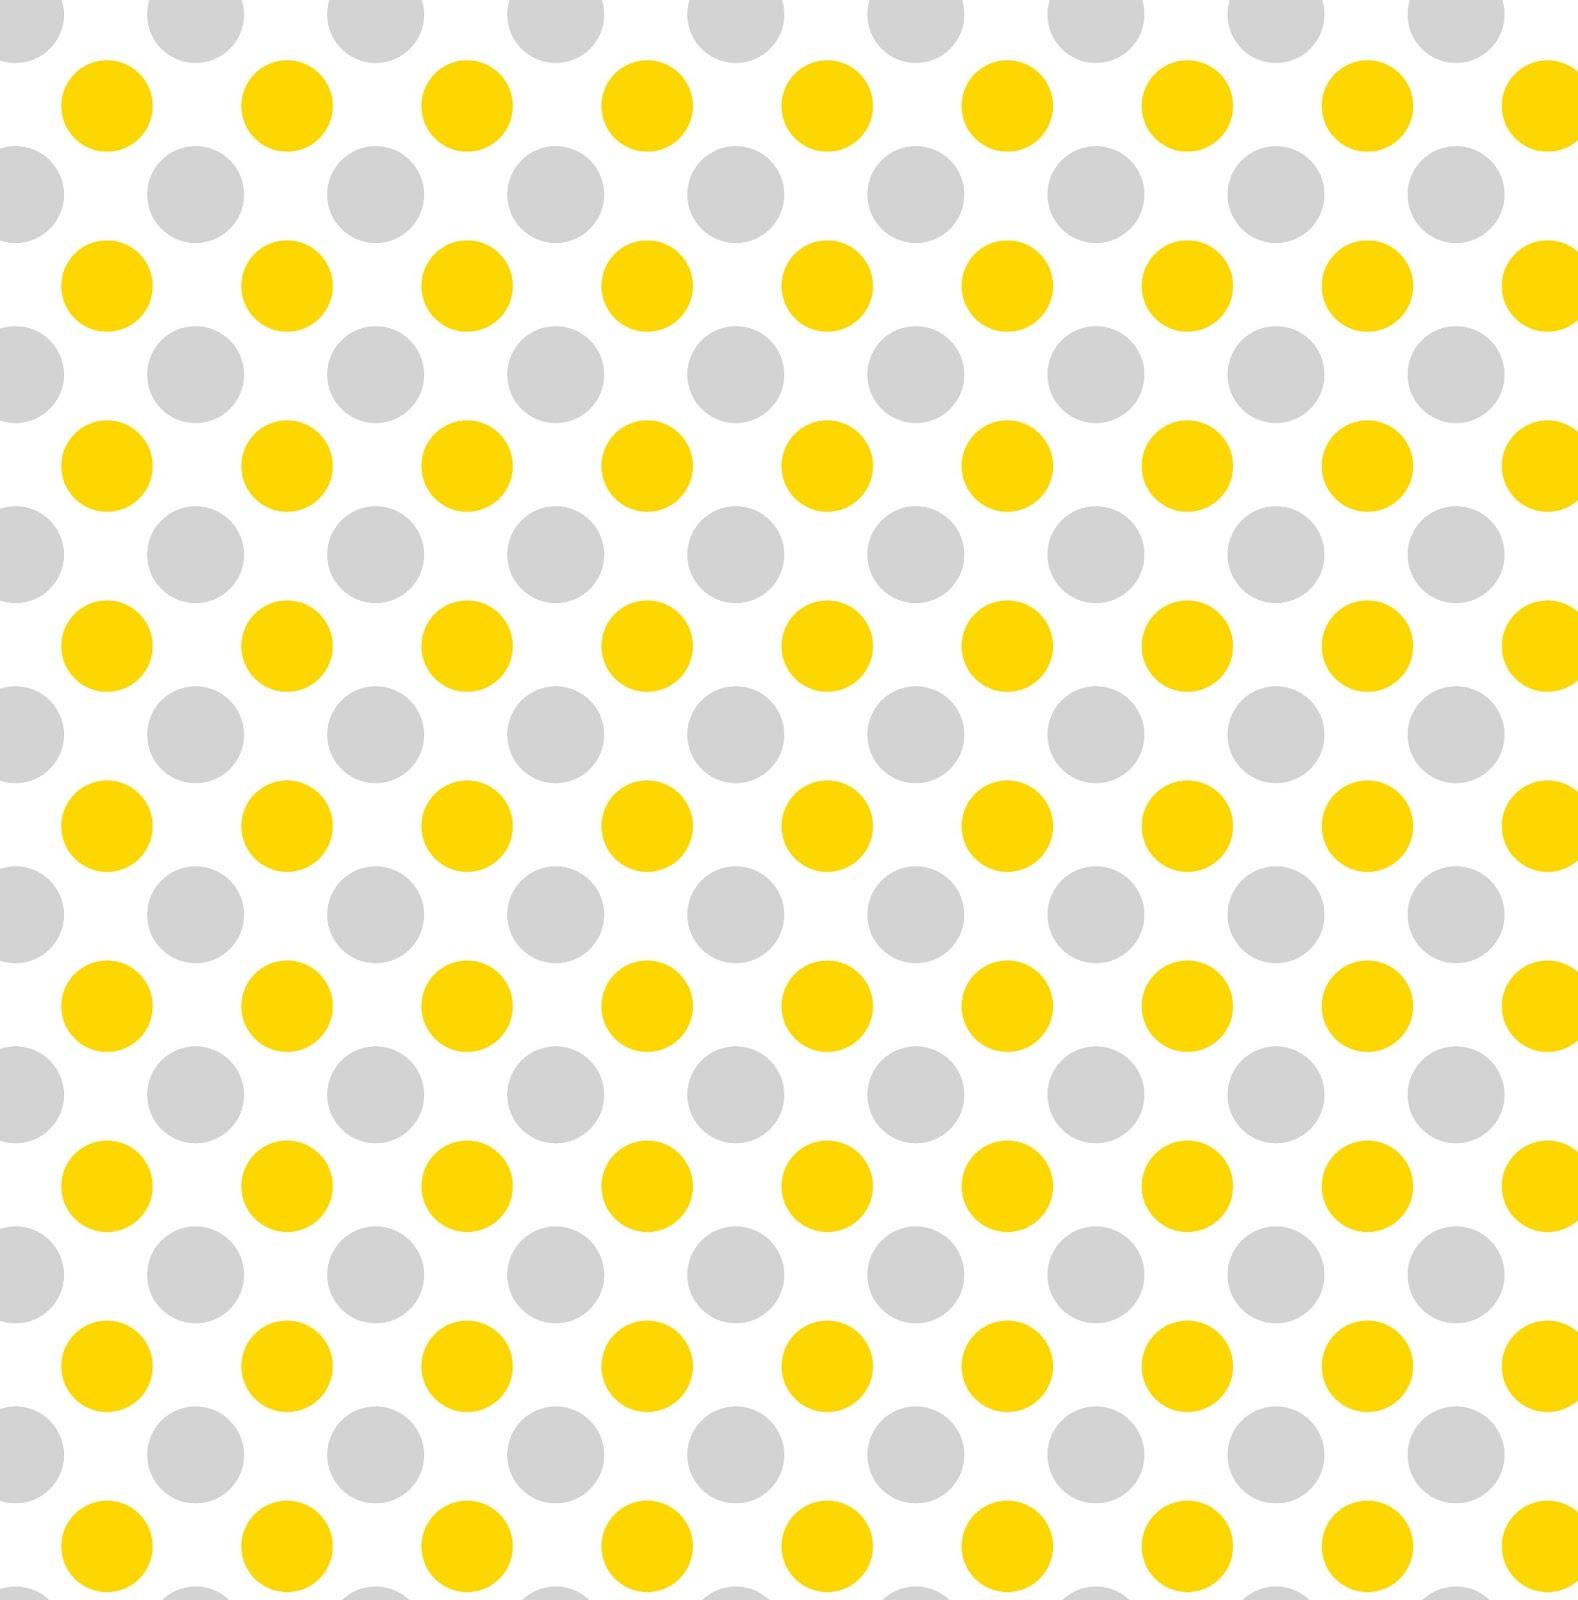 yellow polka dot background gradient glow yellow gradual change